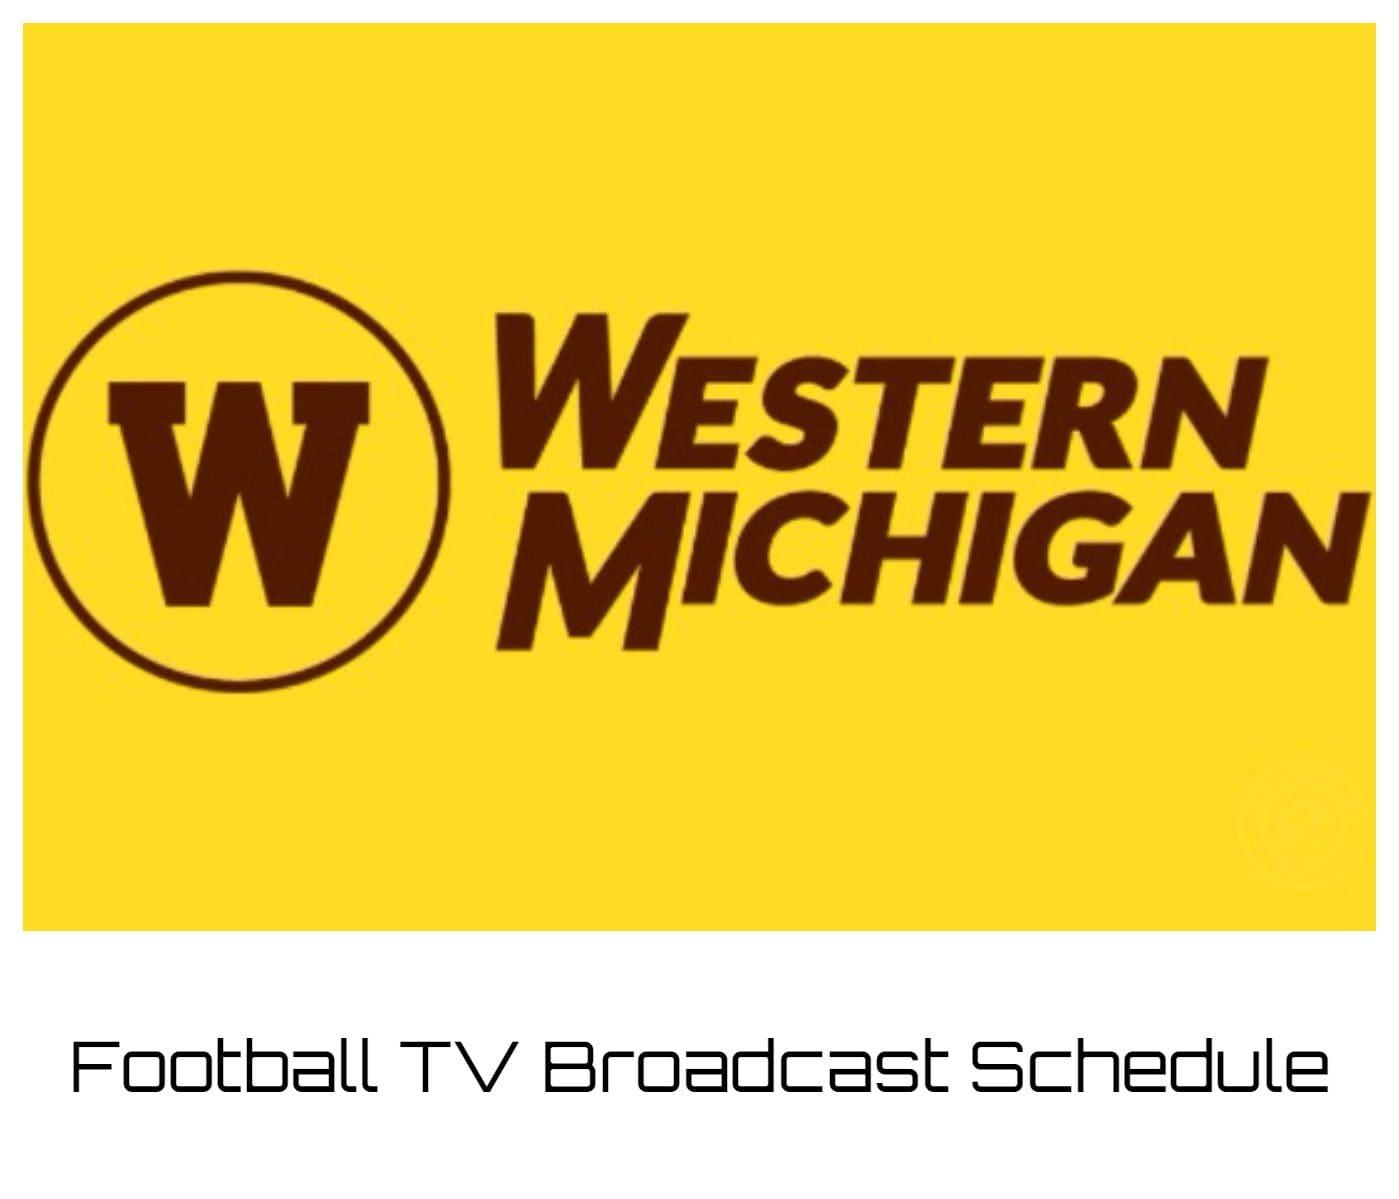 Western Michigan Broncos Football TV Broadcast Schedule